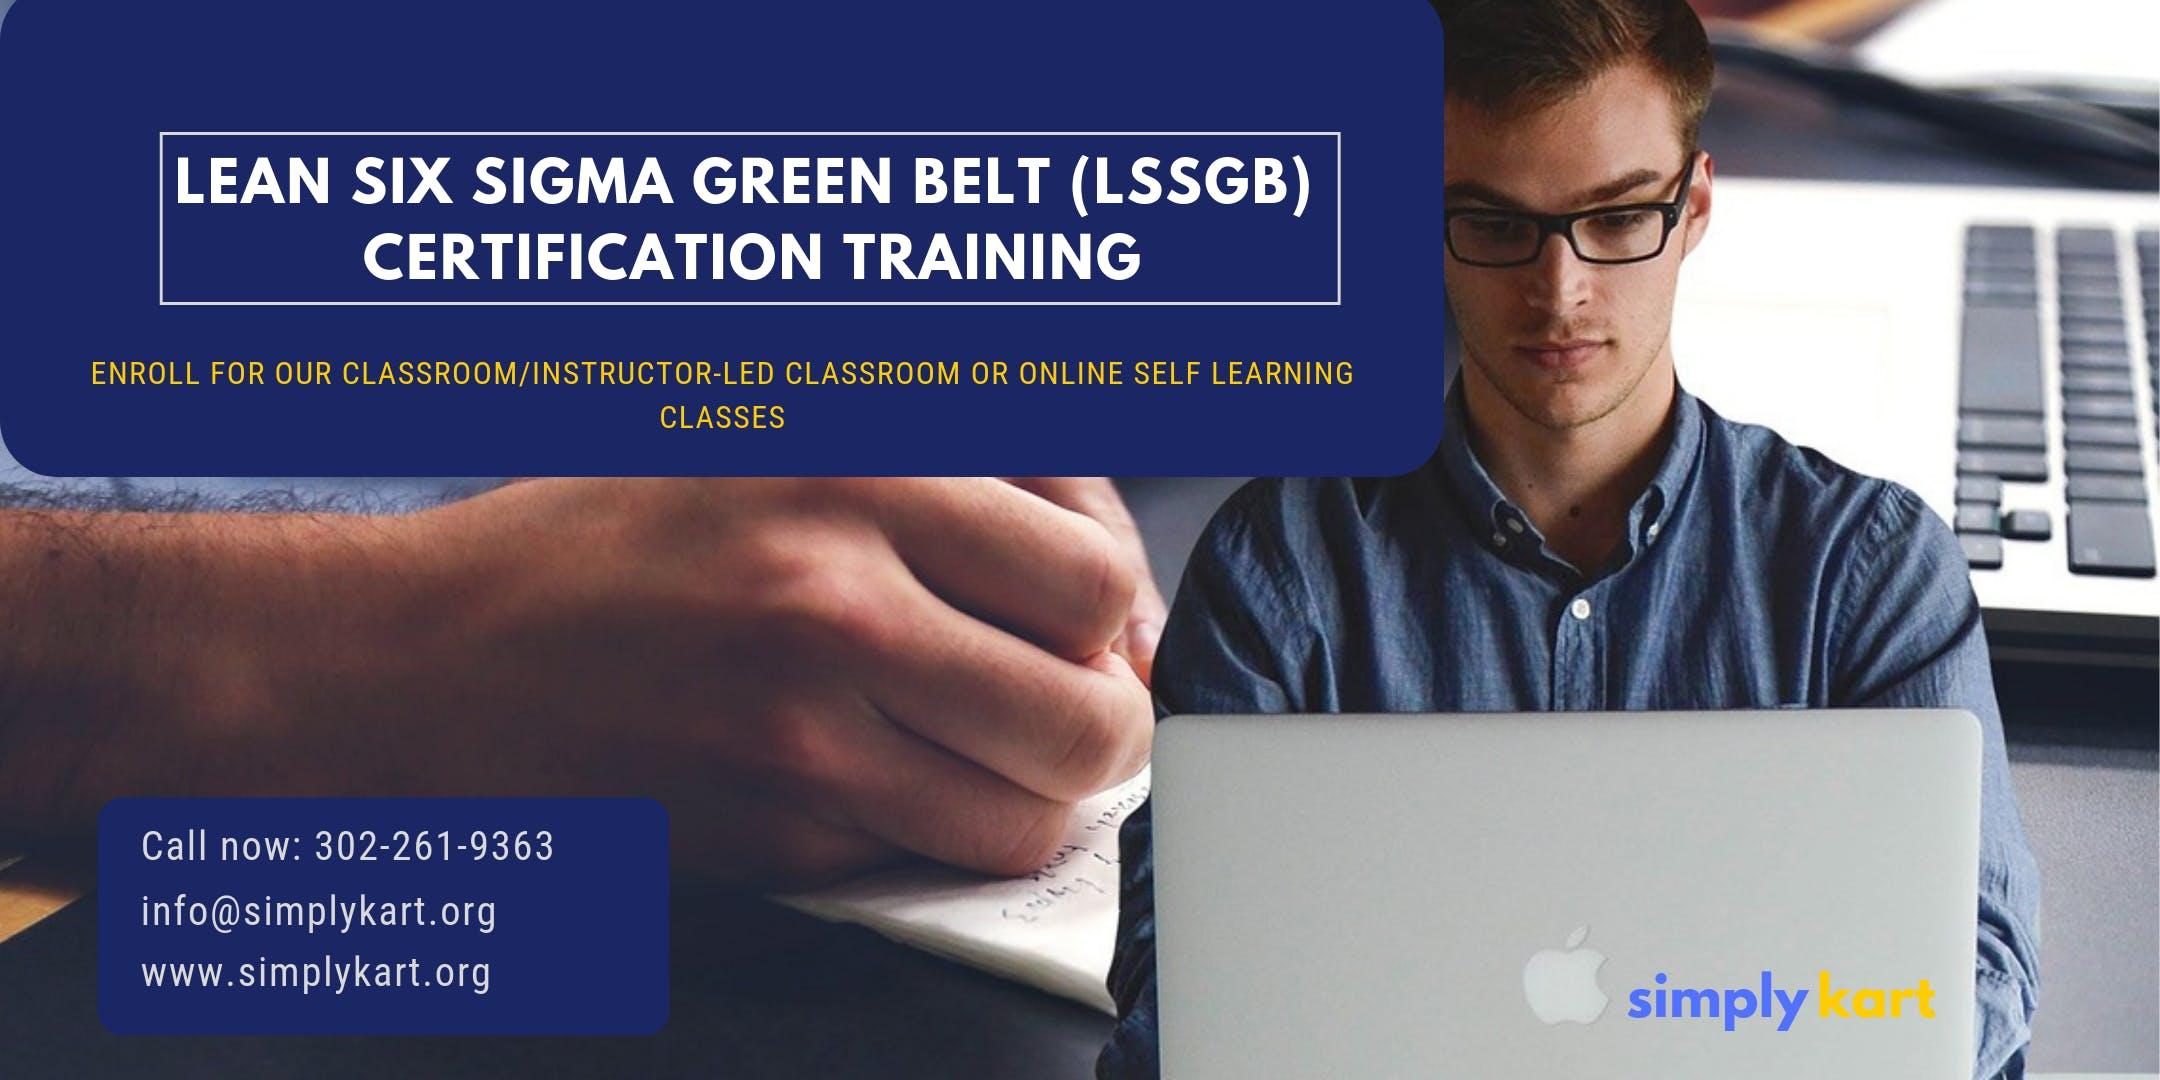 Lean Six Sigma Green Belt (LSSGB) Certification Training in Côte-Saint-Luc, PE